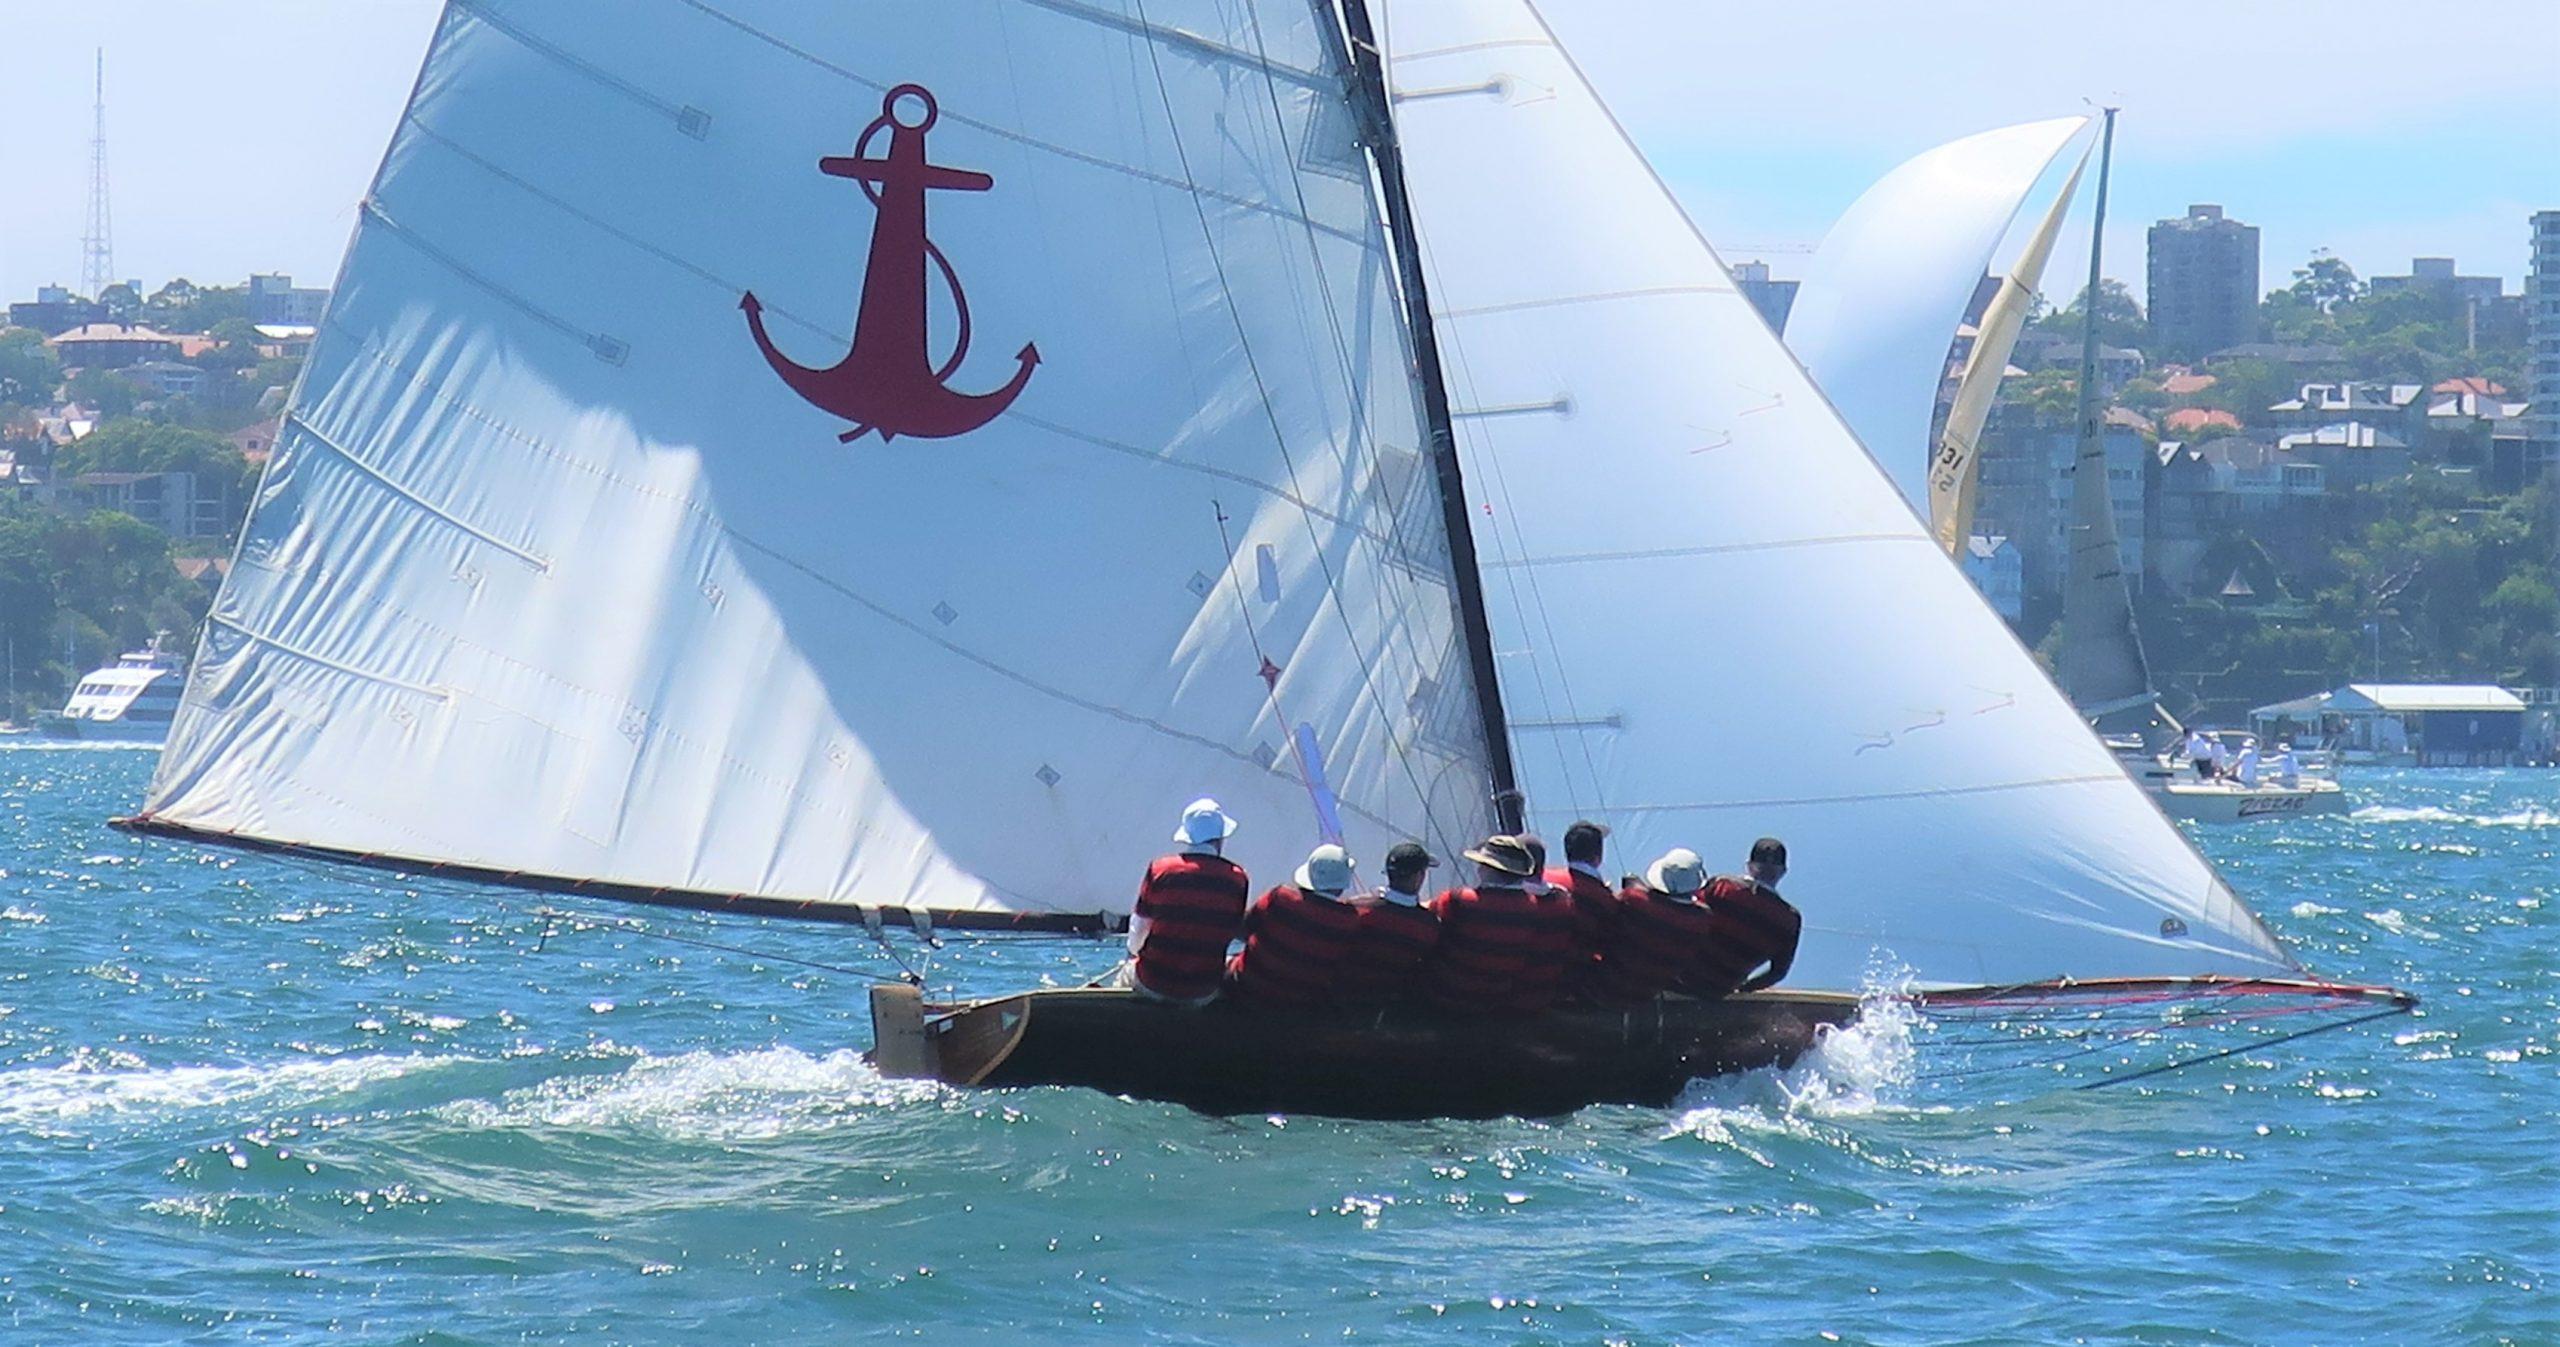 Yendys in the Historical Skiffs Championship. Photo Adrienne Jackson.